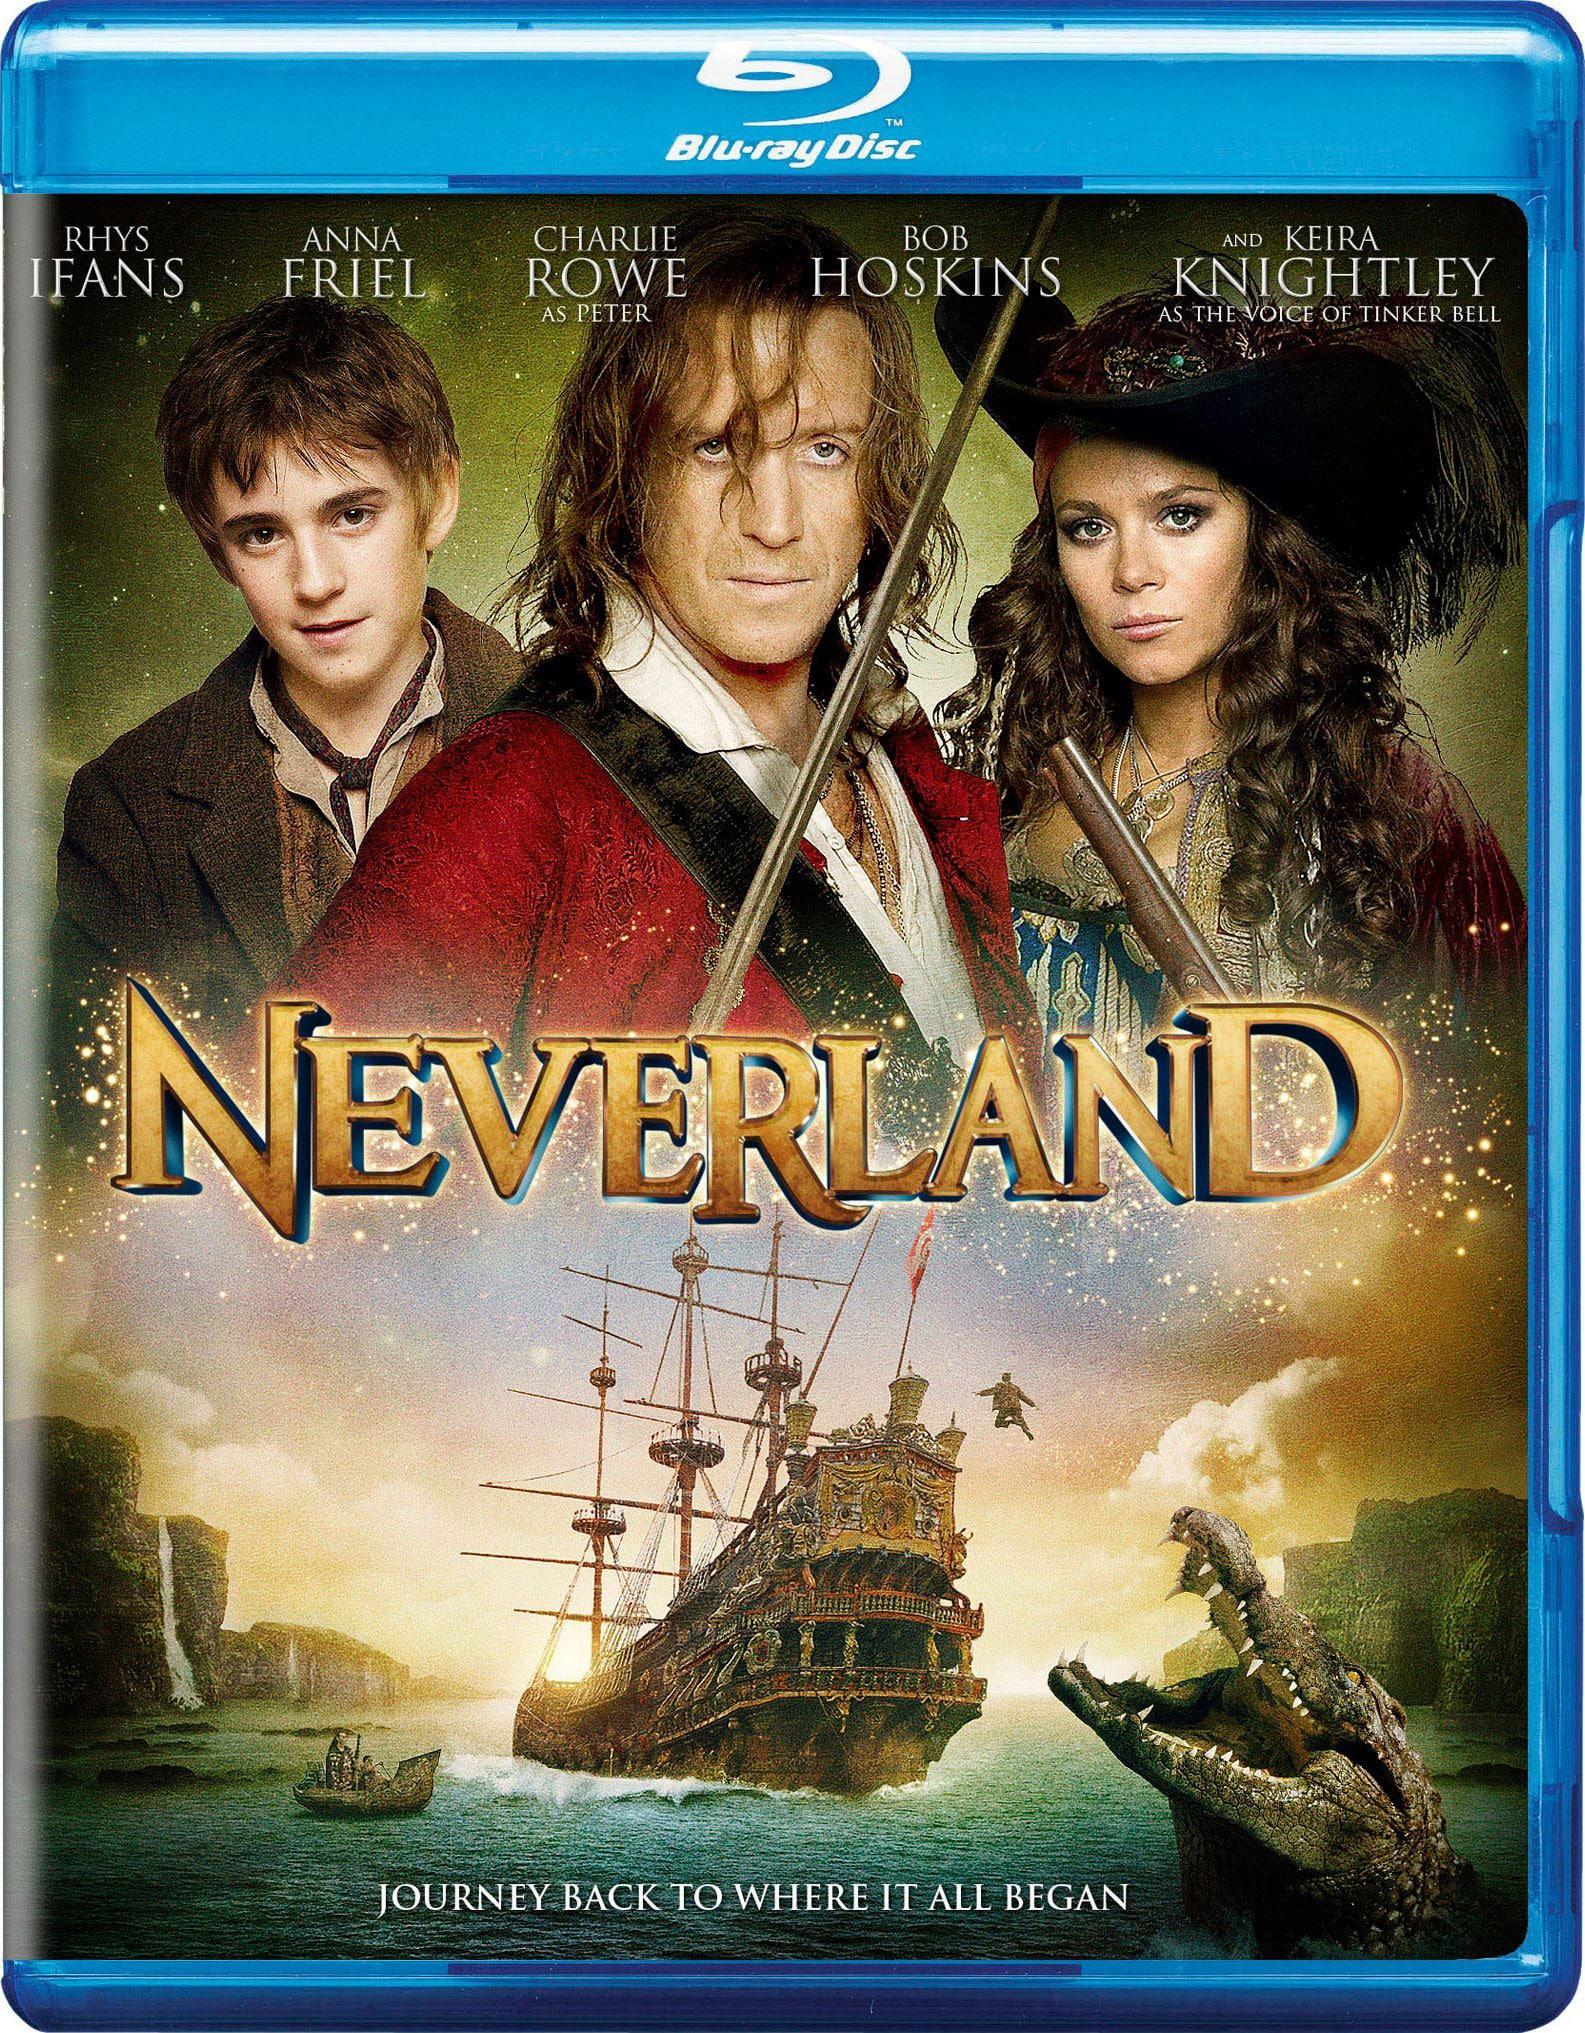 Neverland (Blu-ray Disc)